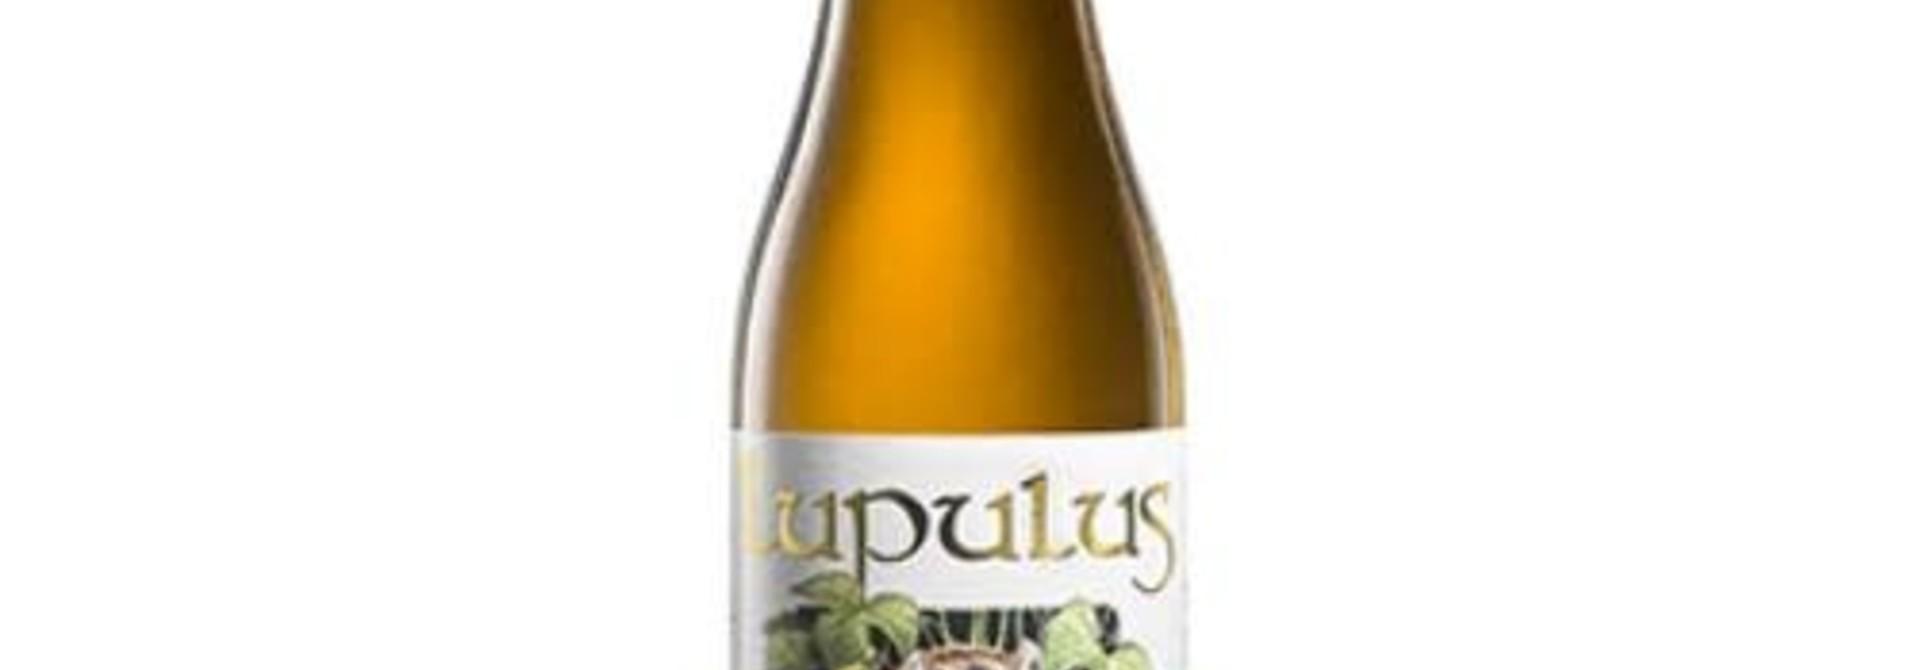 LUPULUS BLONDE TRIPEL 33CL